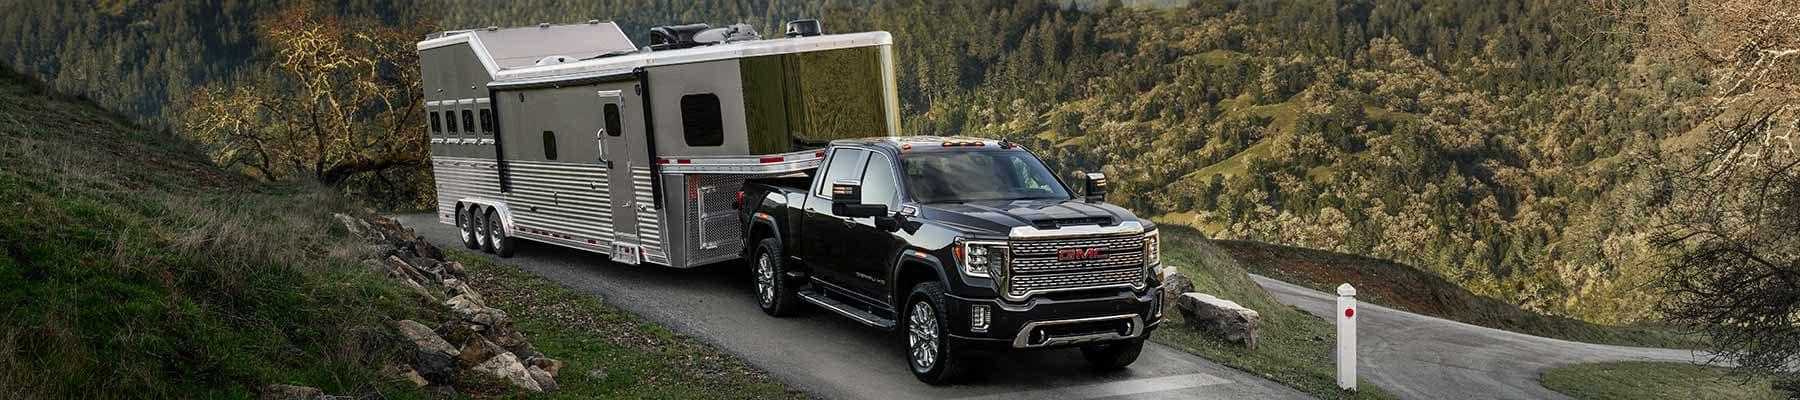 2020 GMC Sierra Duramax Pulling a trailer